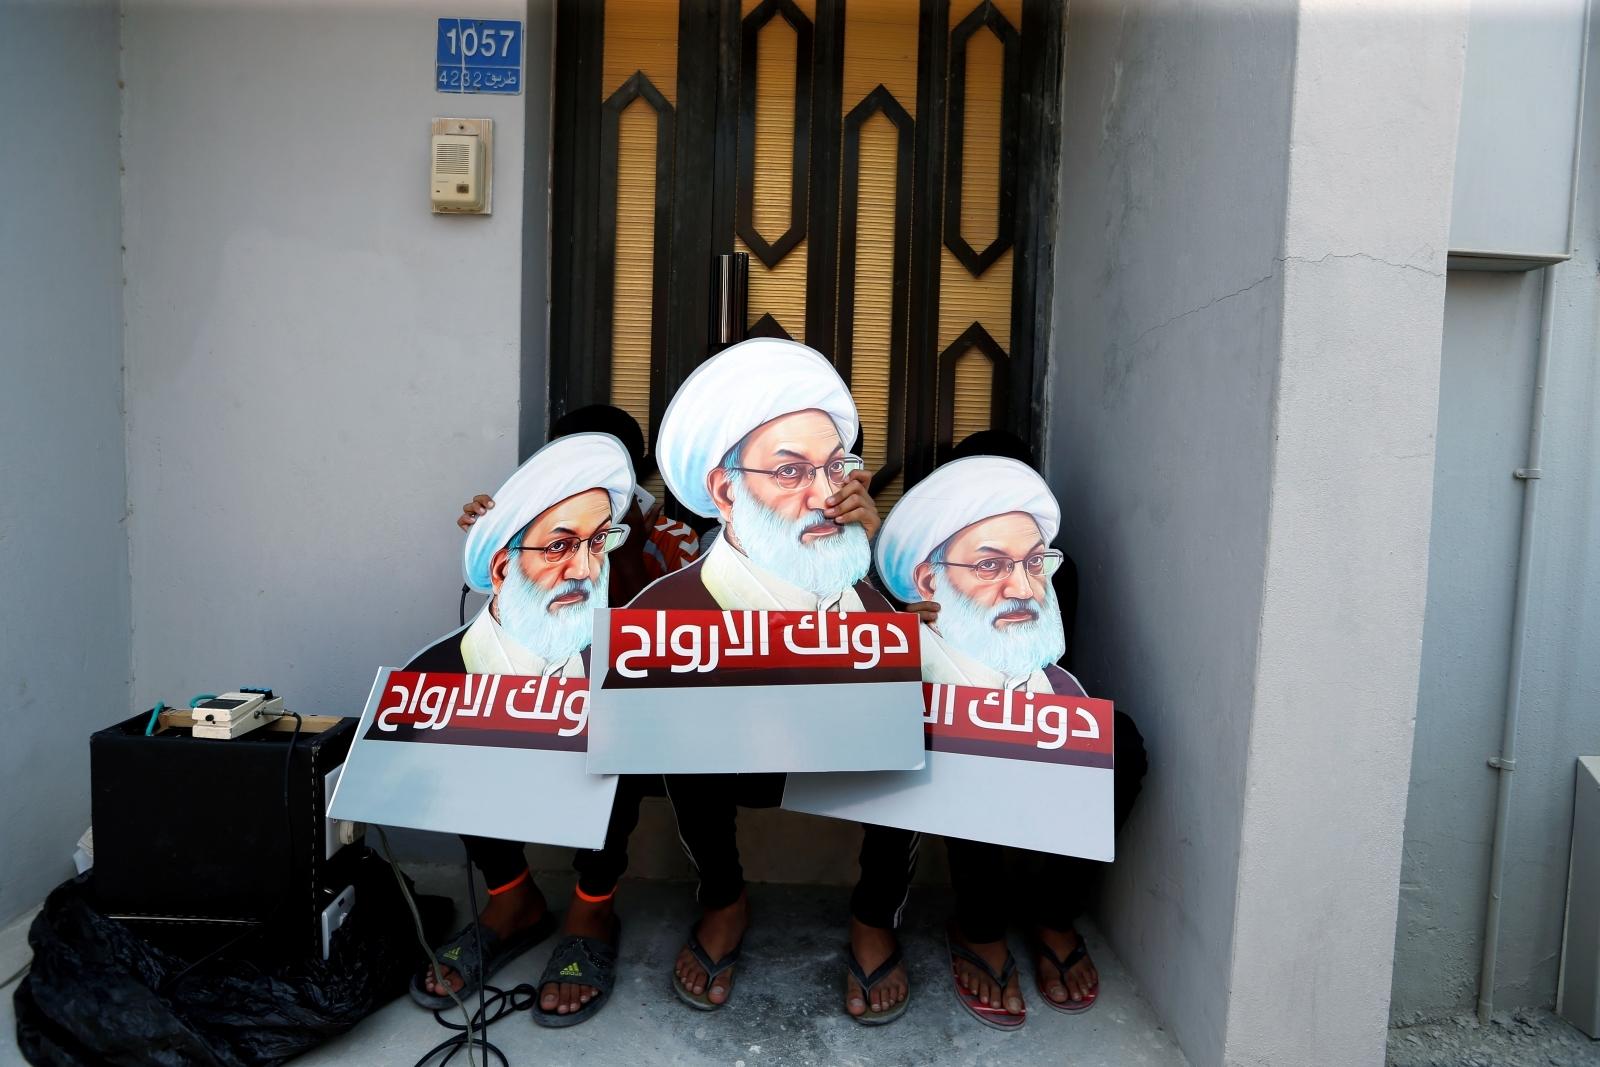 Shia cleric house arrest in Bahrain